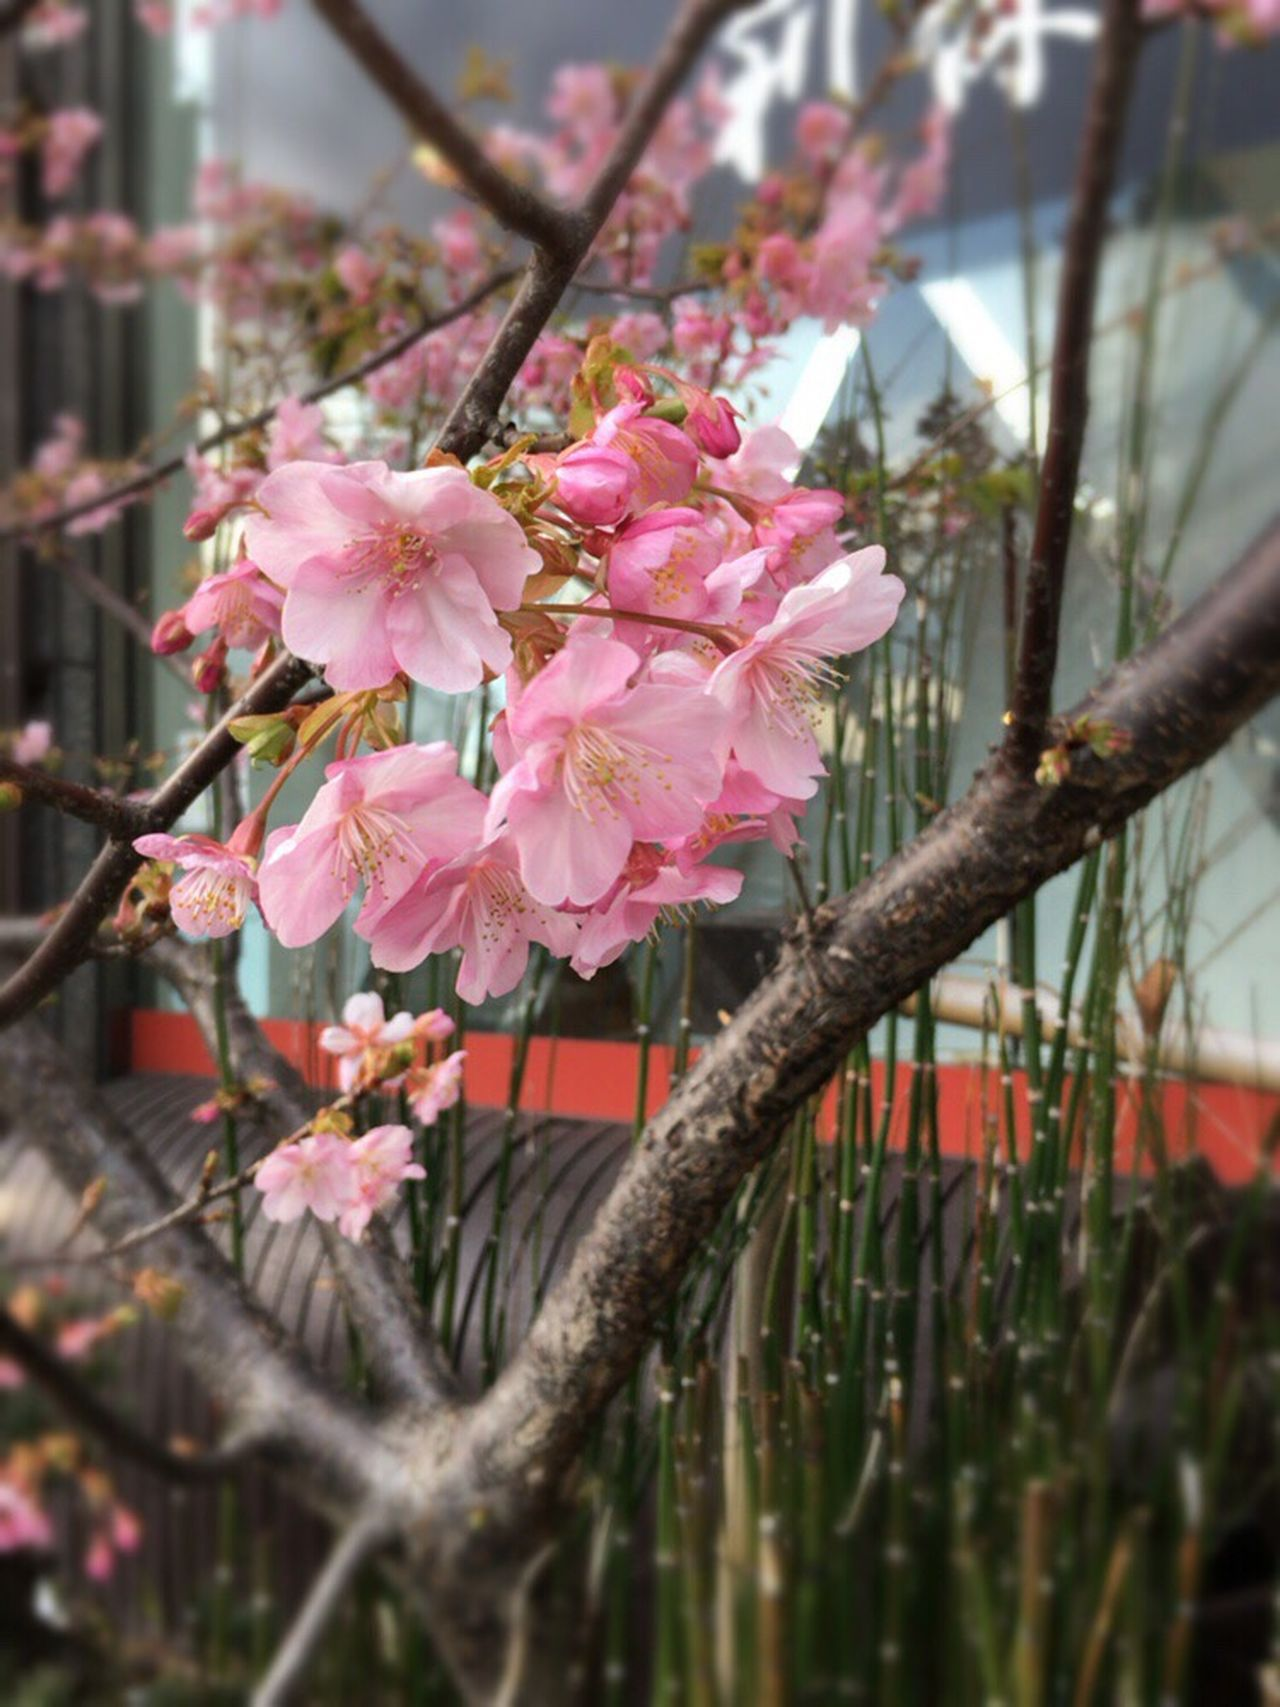 Kyoto Sakura 2017 Kyoto Sakura Kyoto Spling Kyoto Spling Flower Sakura 2017 Kyoto Cherry Blossom Cherry Blossoms Kyoto,japan Kyoto City Cherry Blossom Sakura Equisetum Hyemale TOKUSA